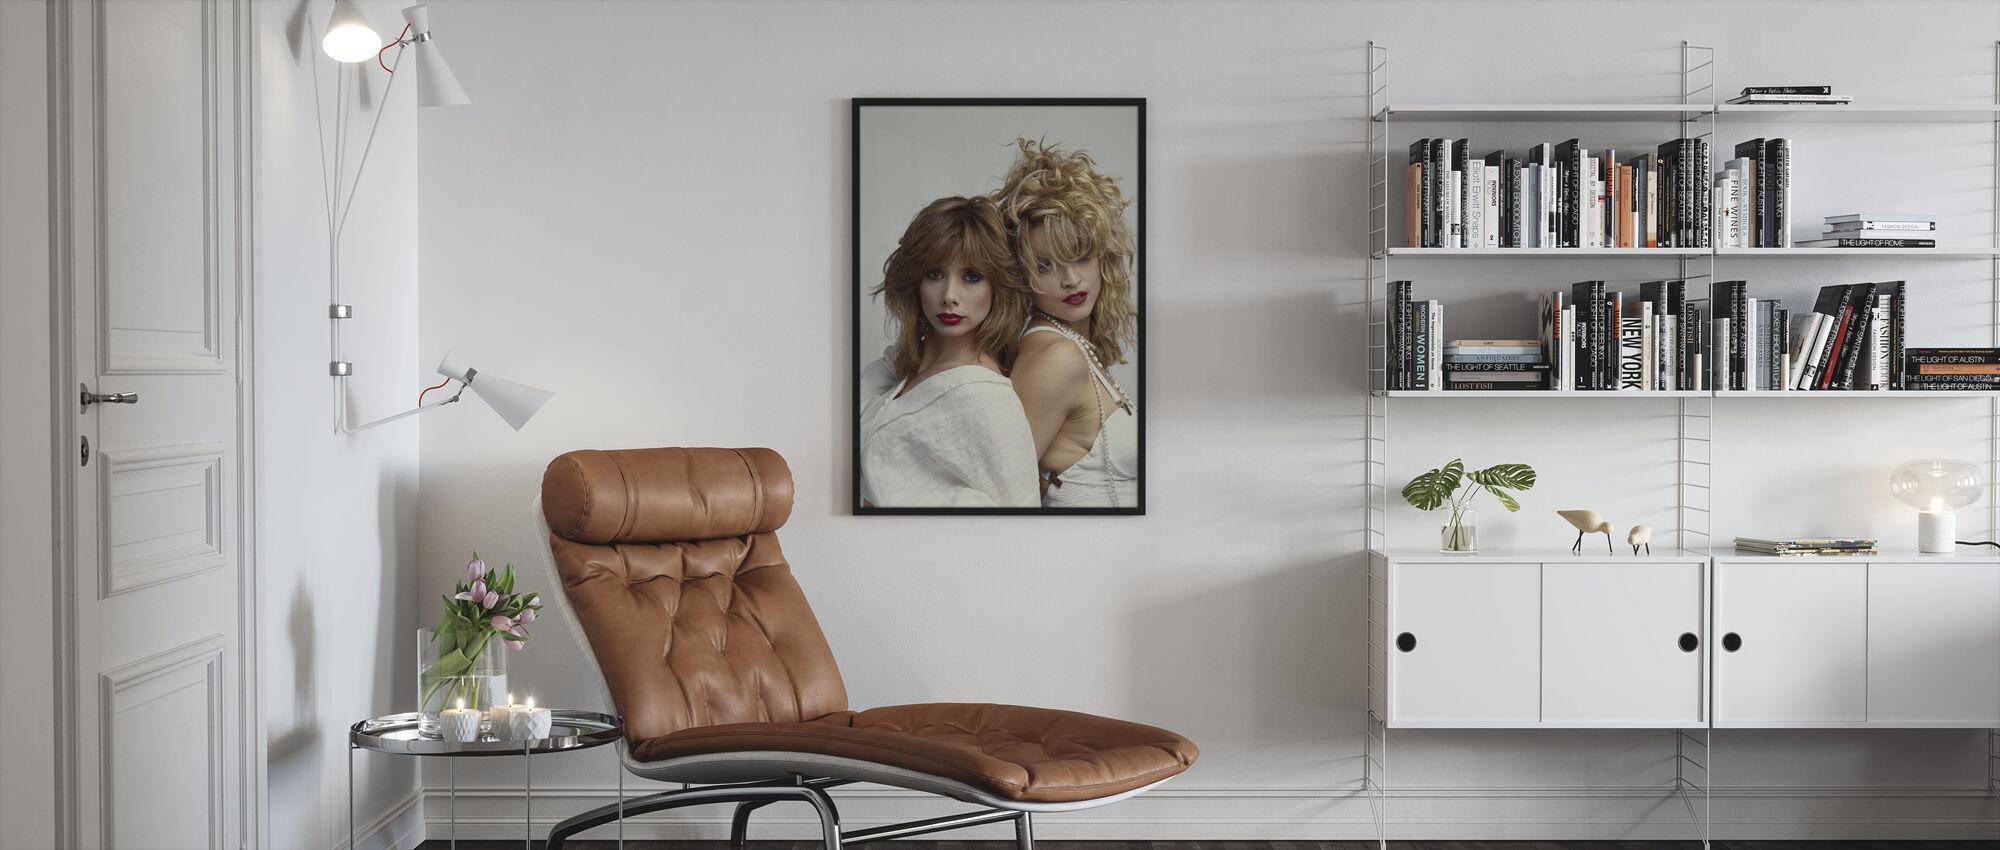 Desperately Seeking Susan - Madonna - Framed print - Living Room